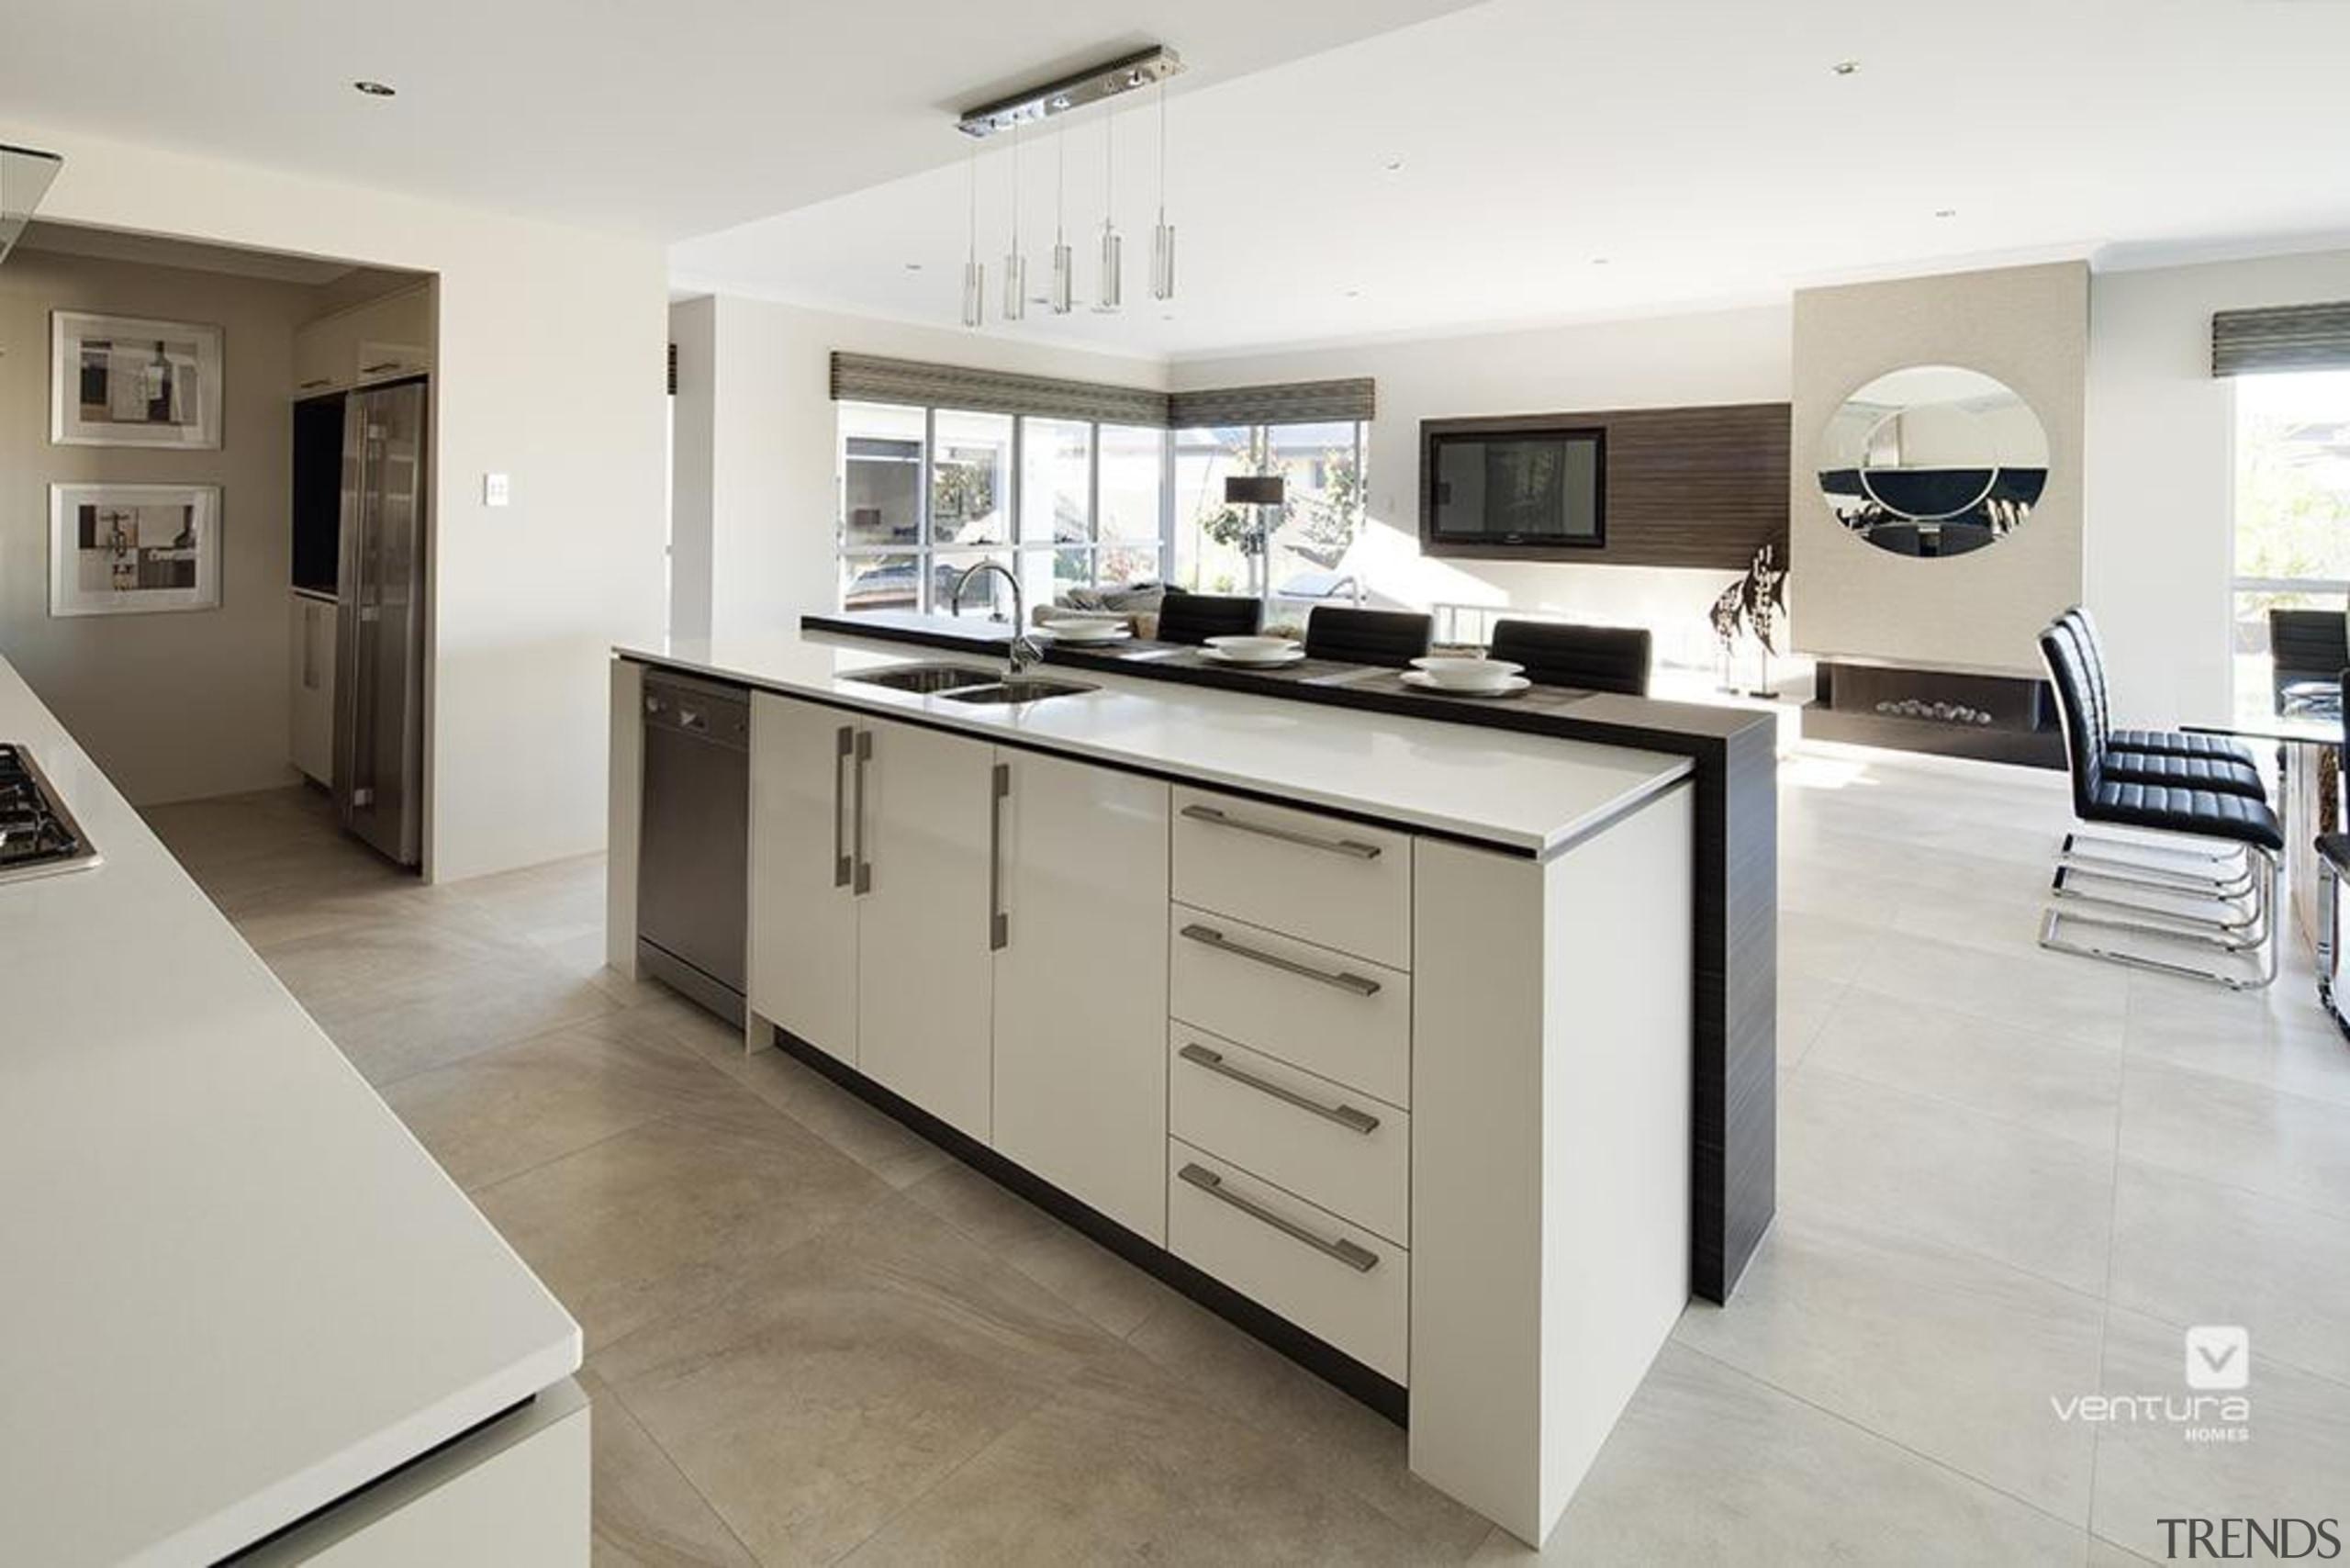 Kitchen design. - The Sentosa Display Home - cabinetry, countertop, cuisine classique, floor, interior design, kitchen, property, real estate, room, white